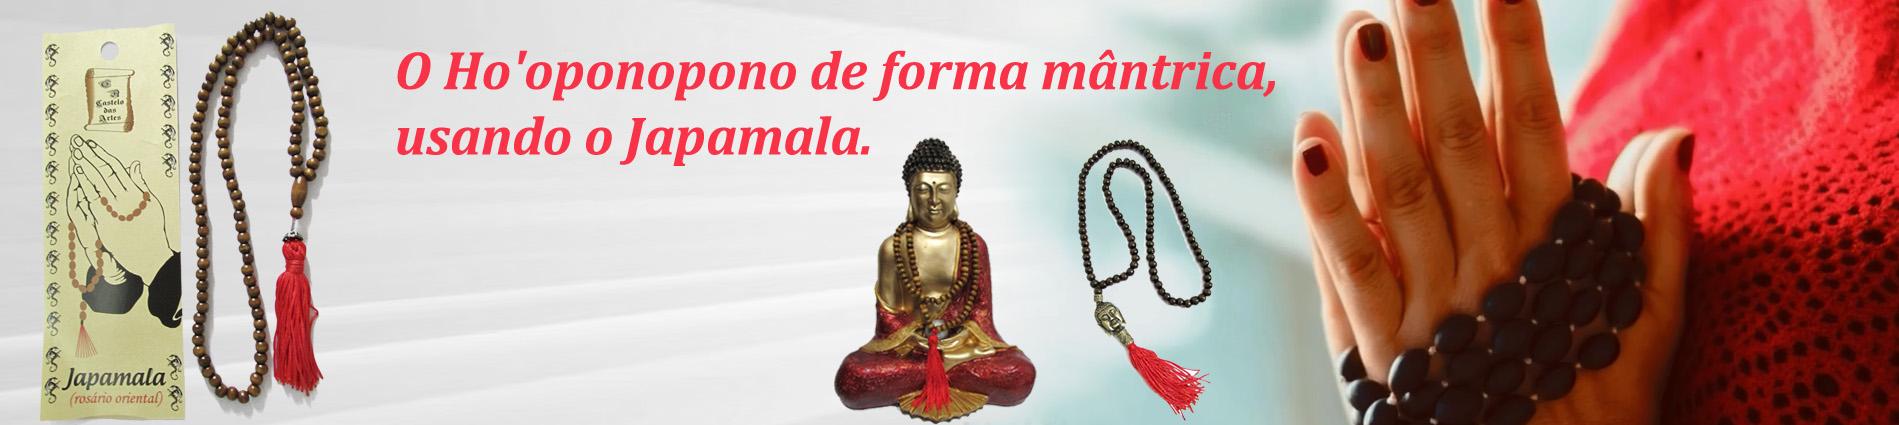 https://cdn.brasilesoterico.com/imagens_banners/24d5c7a4bf1e985fe74b500839117c8b.jpg